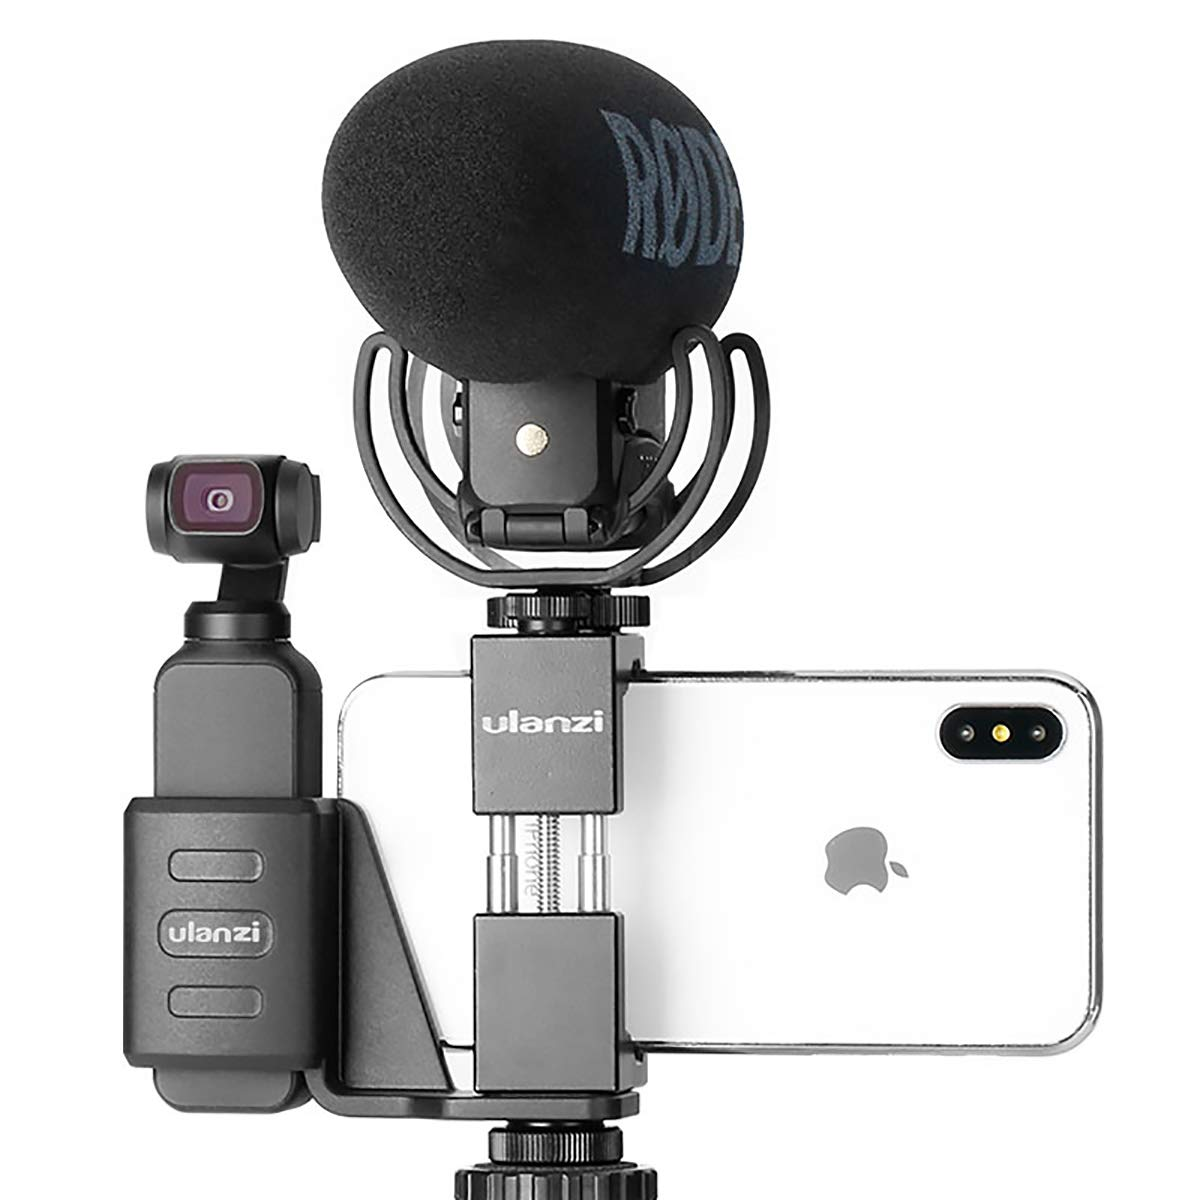 ULANZI OP-1 Handheld Phone Holder Mobile Bracket Set Gimbal Stand Tripod Mount w Cold Shoe Mount for DJI OSMO Pocket